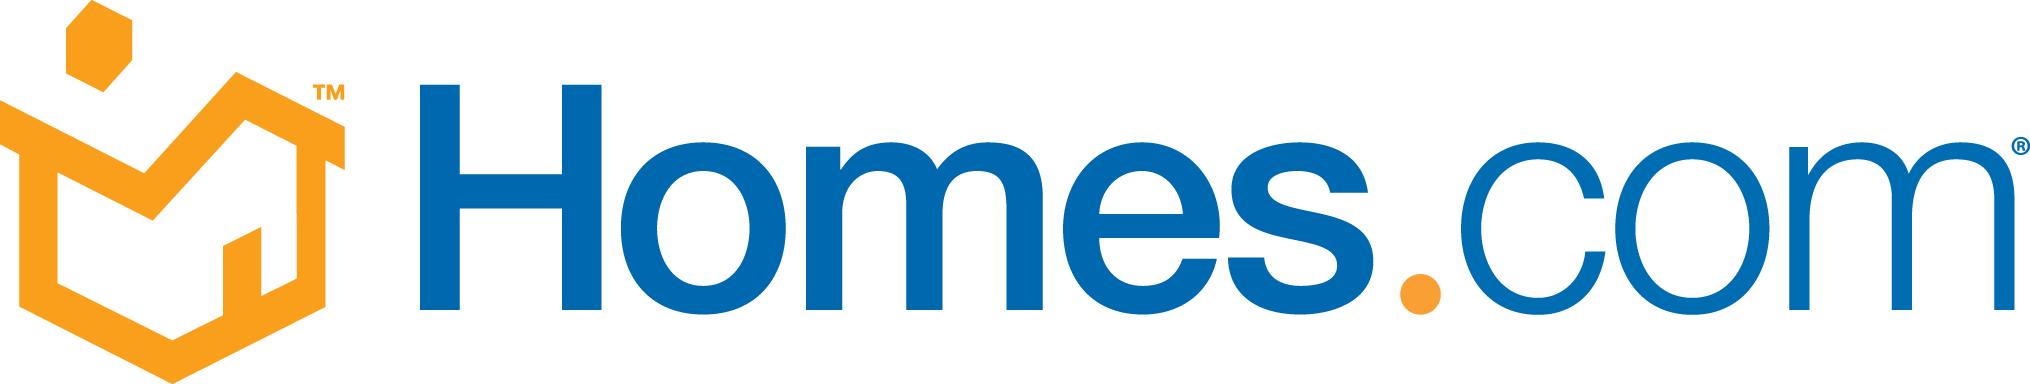 Homes.com Logo Full resolution